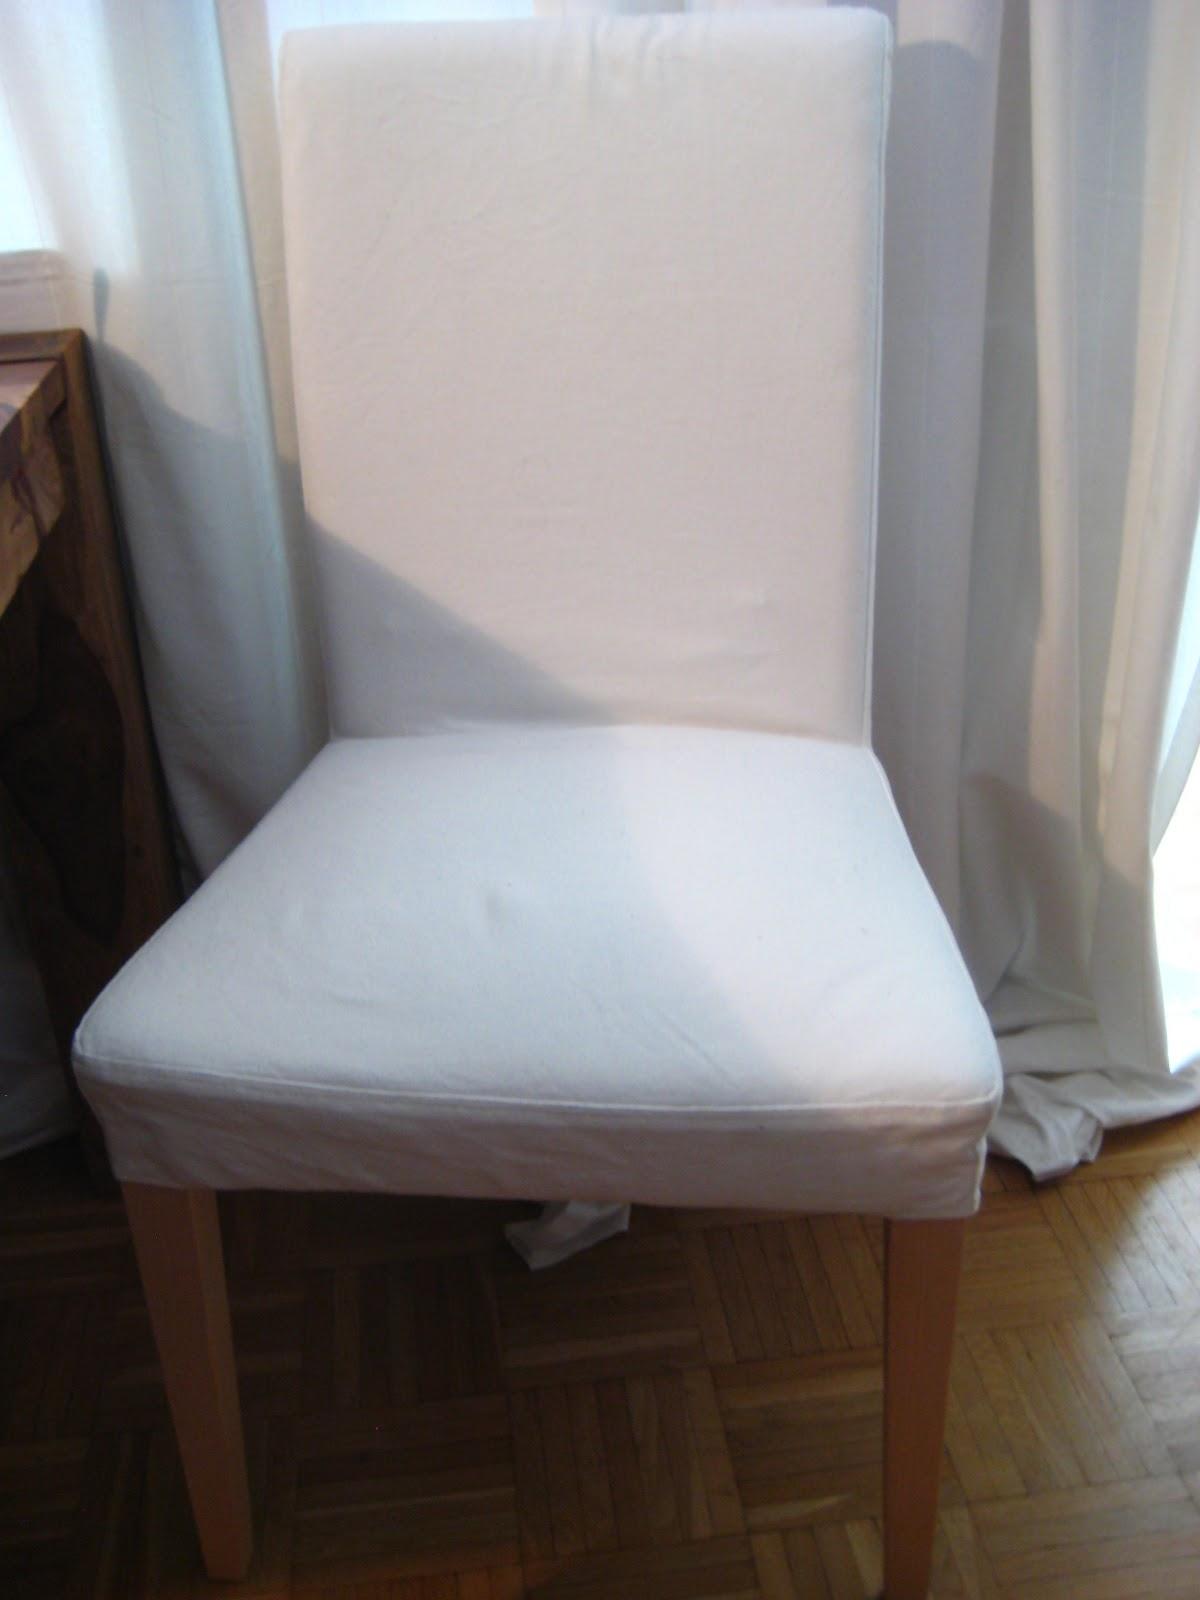 Second Furniture Regensburg IKEA Stühle